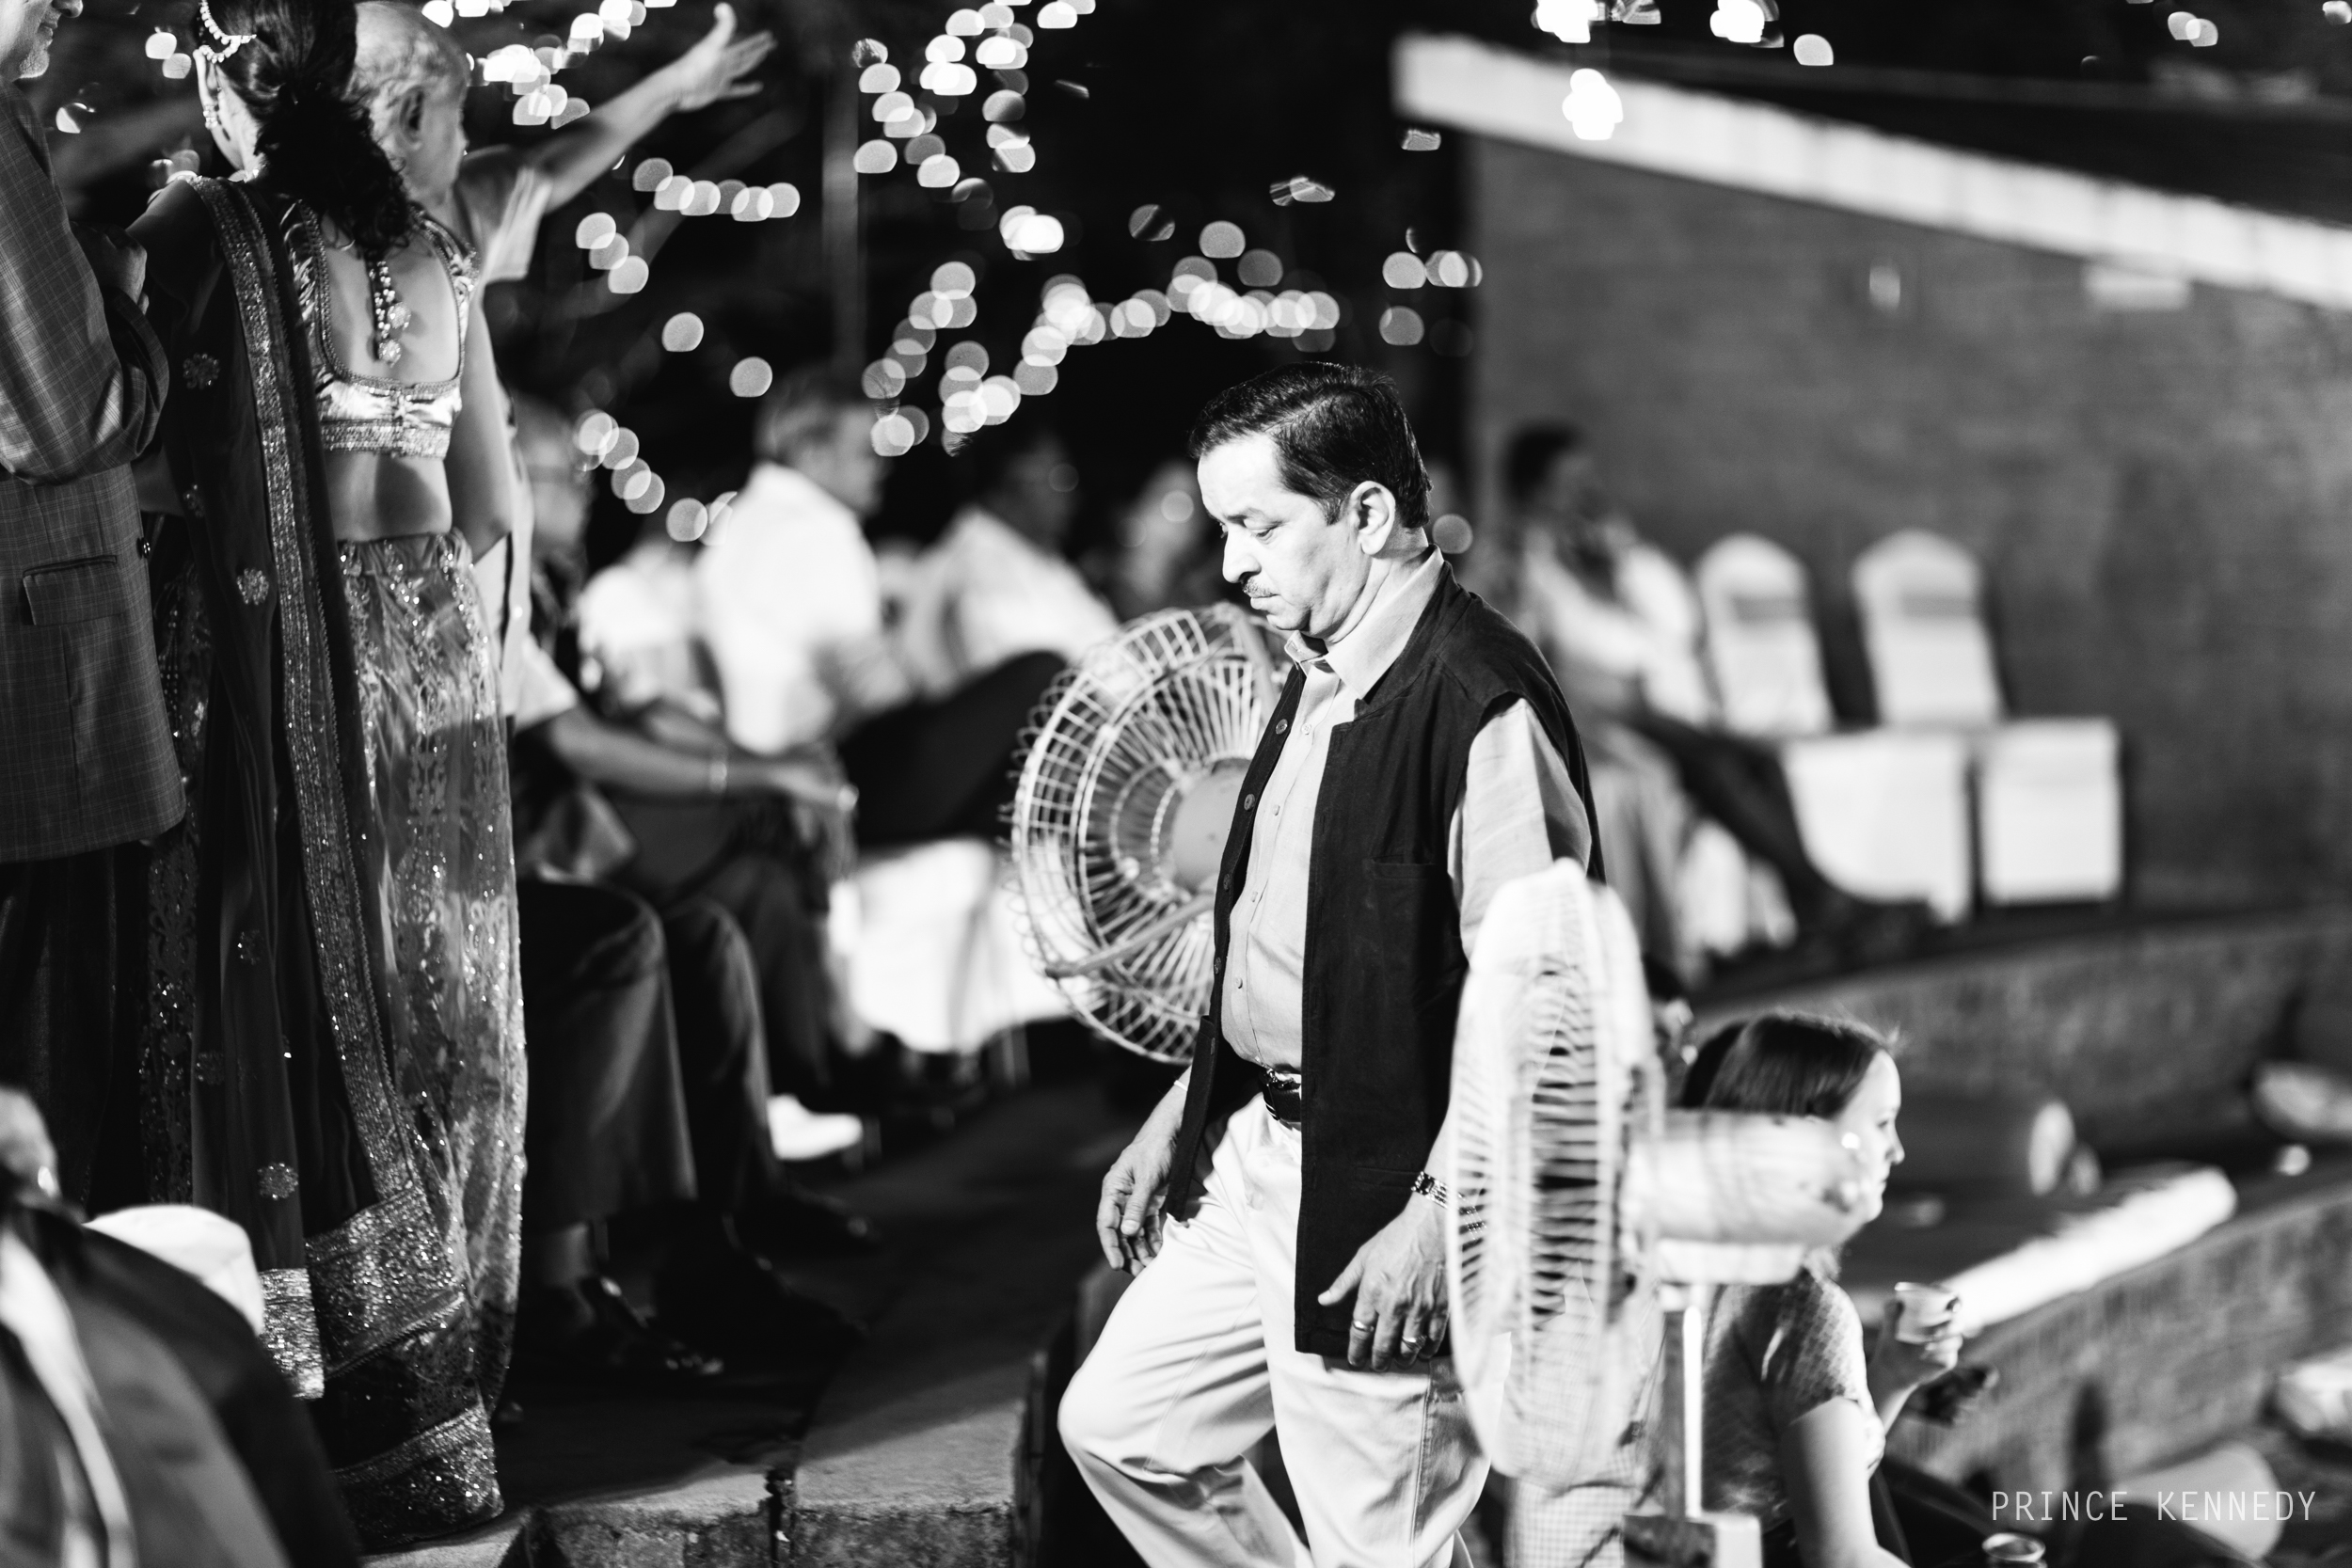 Athmajja-Nithesh-Engagement-Couple-Portrait-Portraiture-Wedding-Couple-Portrait-Chennai-Photographer-Candid-Photography-Destination-Best-Prince-Kennedy-Photography-137.jpg